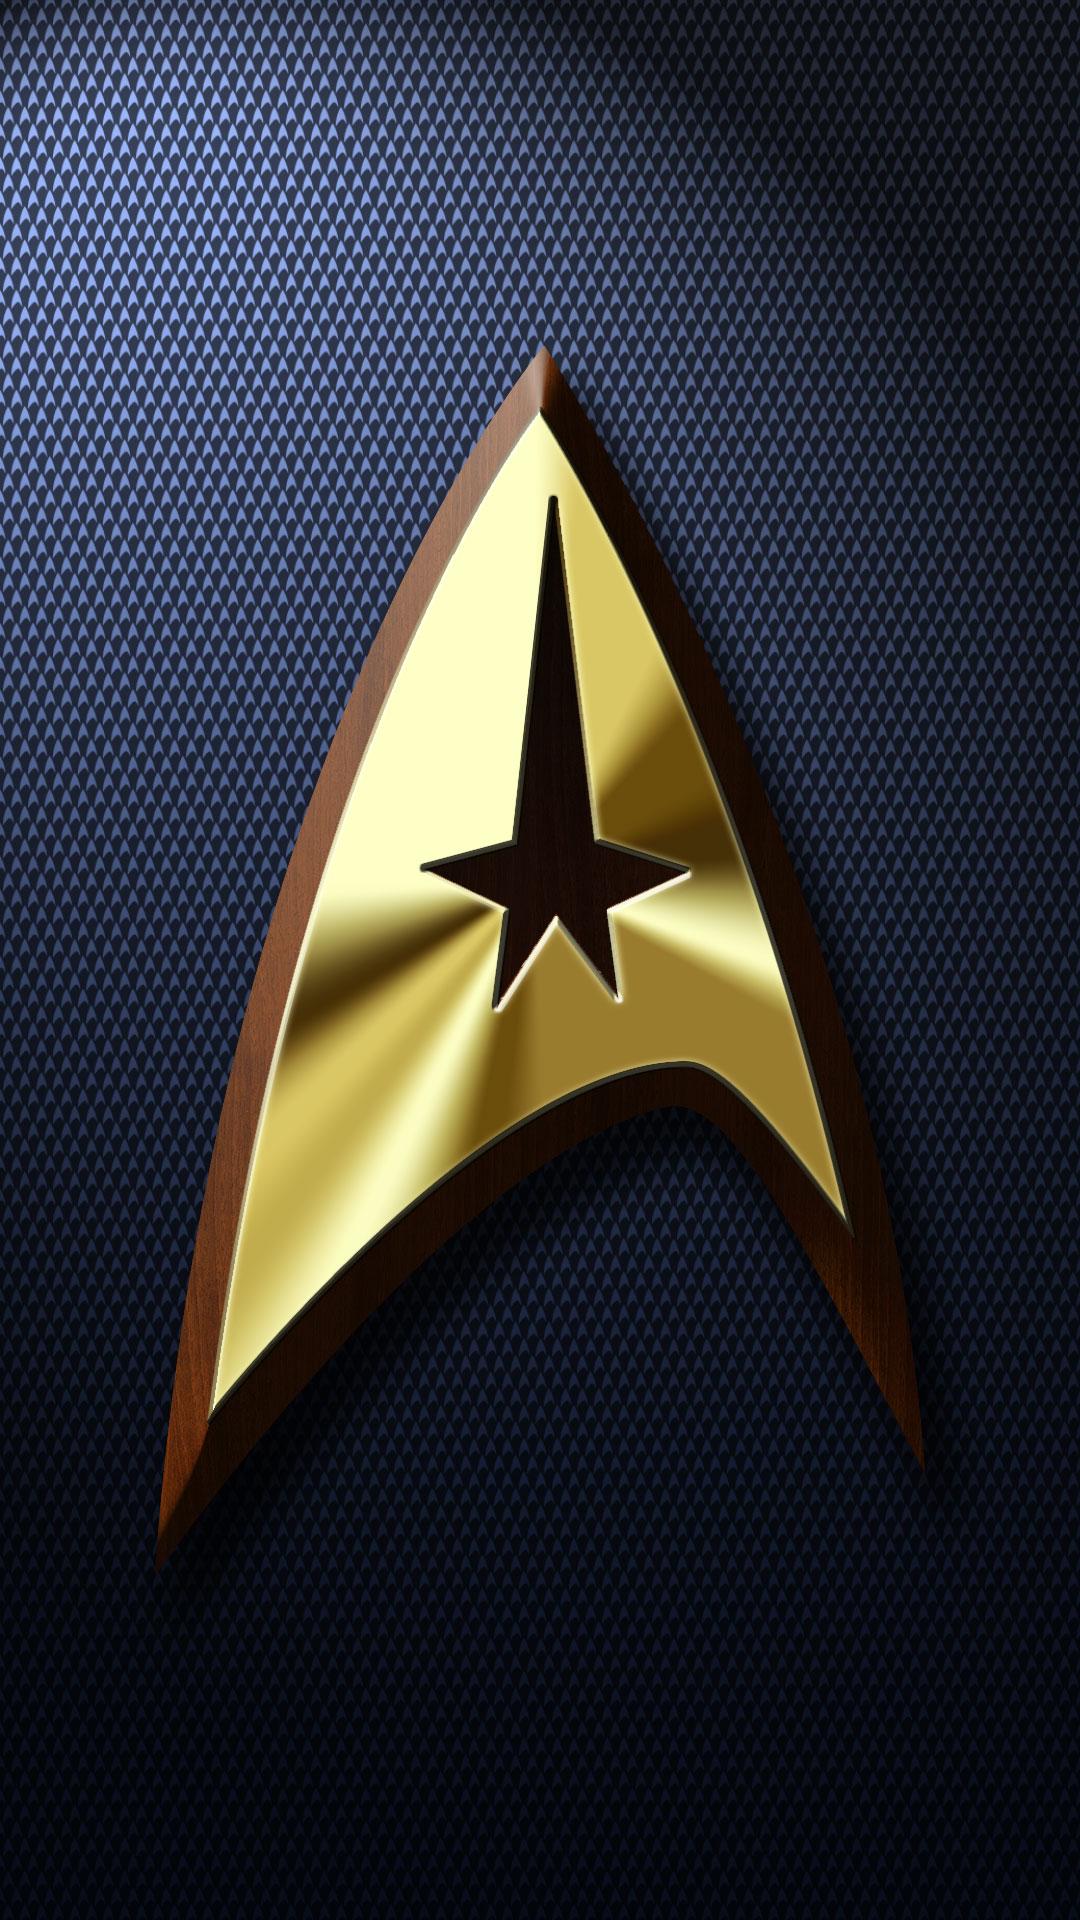 Trek phone wallpaper by balsavor on deviantart - Star trek symbol wallpaper ...